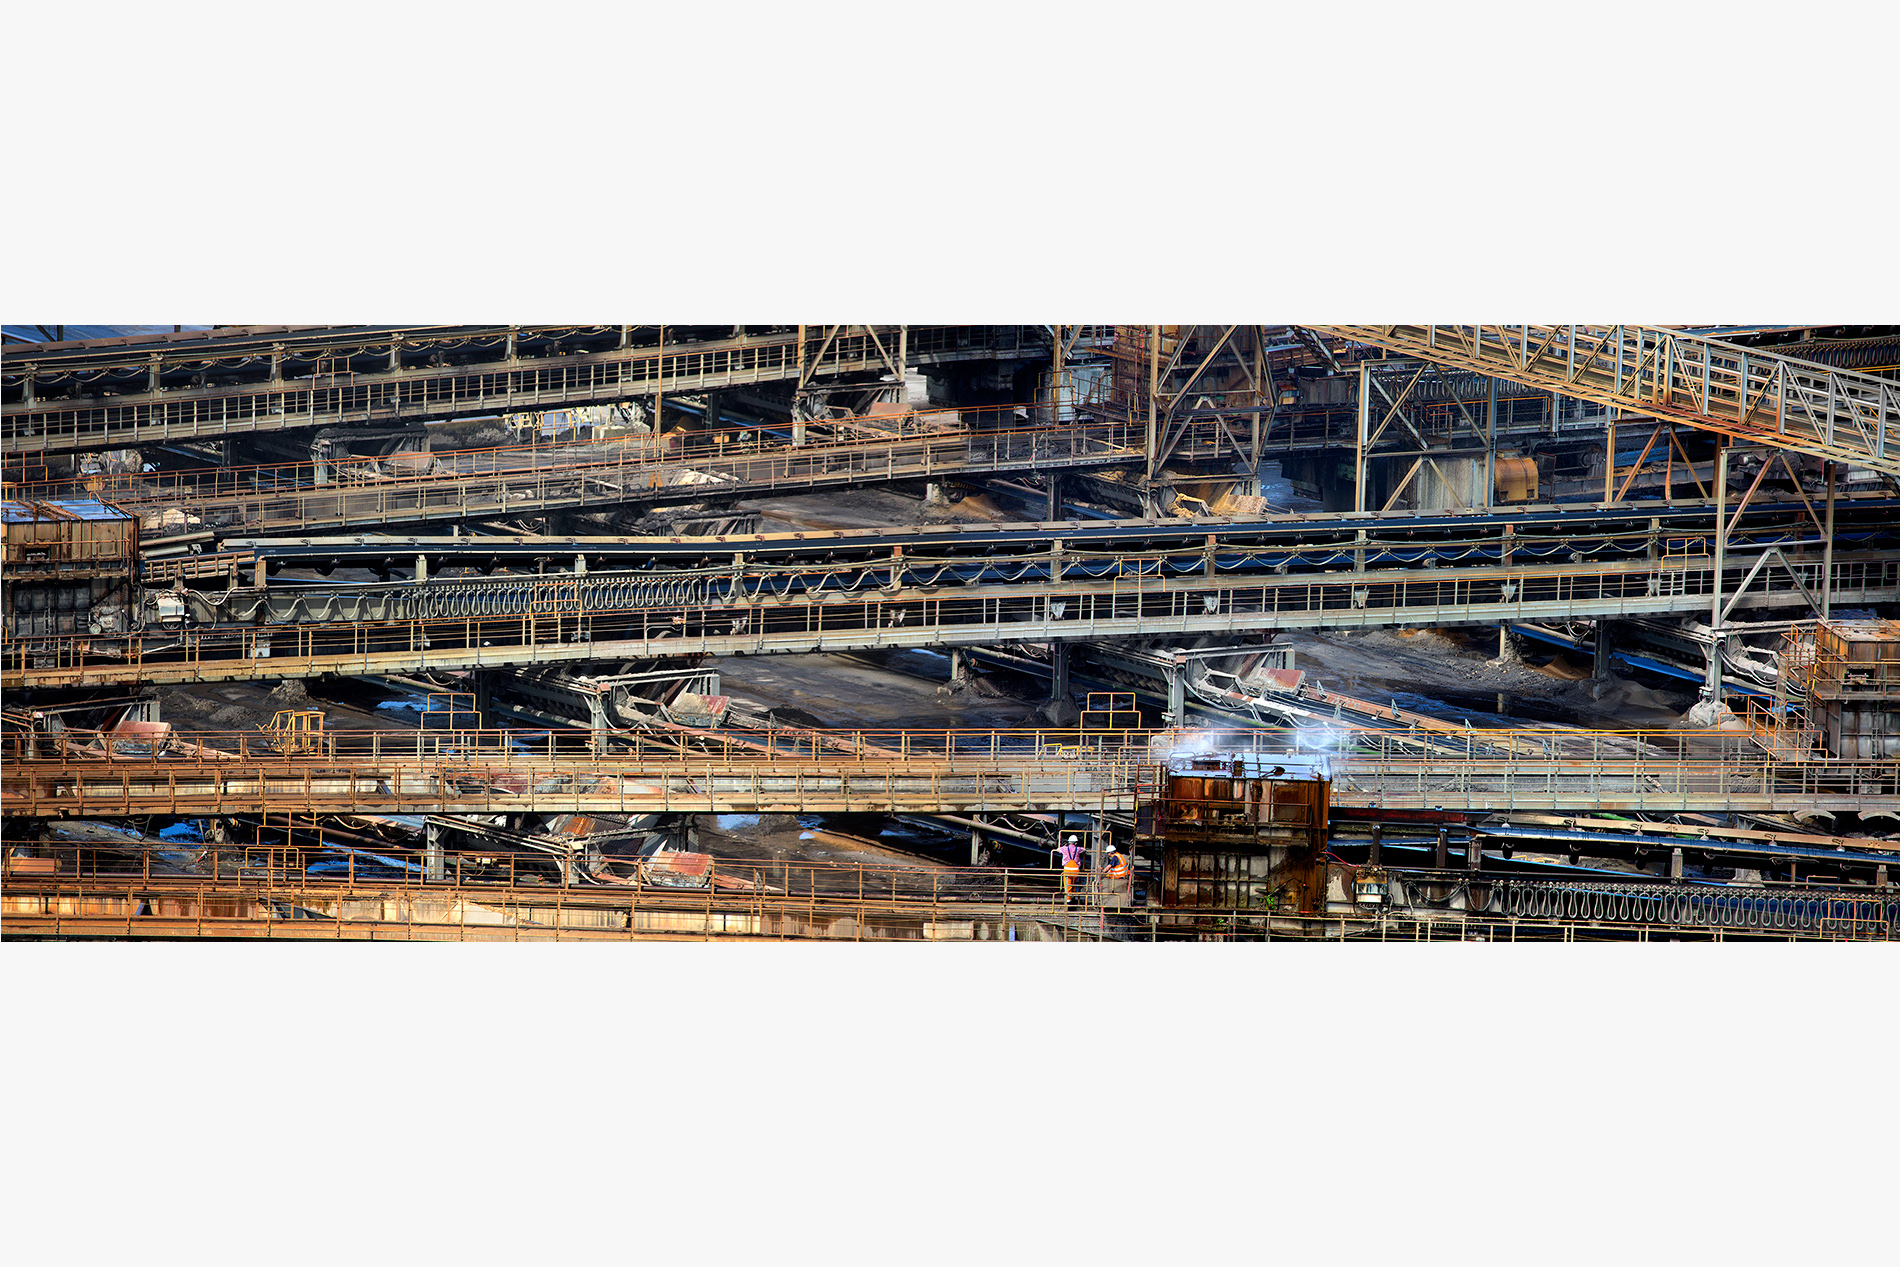 Balafres 739 - 741 (2015-16) Pigment inks on Fine Art paper, 39 x 120 cm, 3 + 2 AP, Artist's Collection  ©Tania Mouraud ADAGP